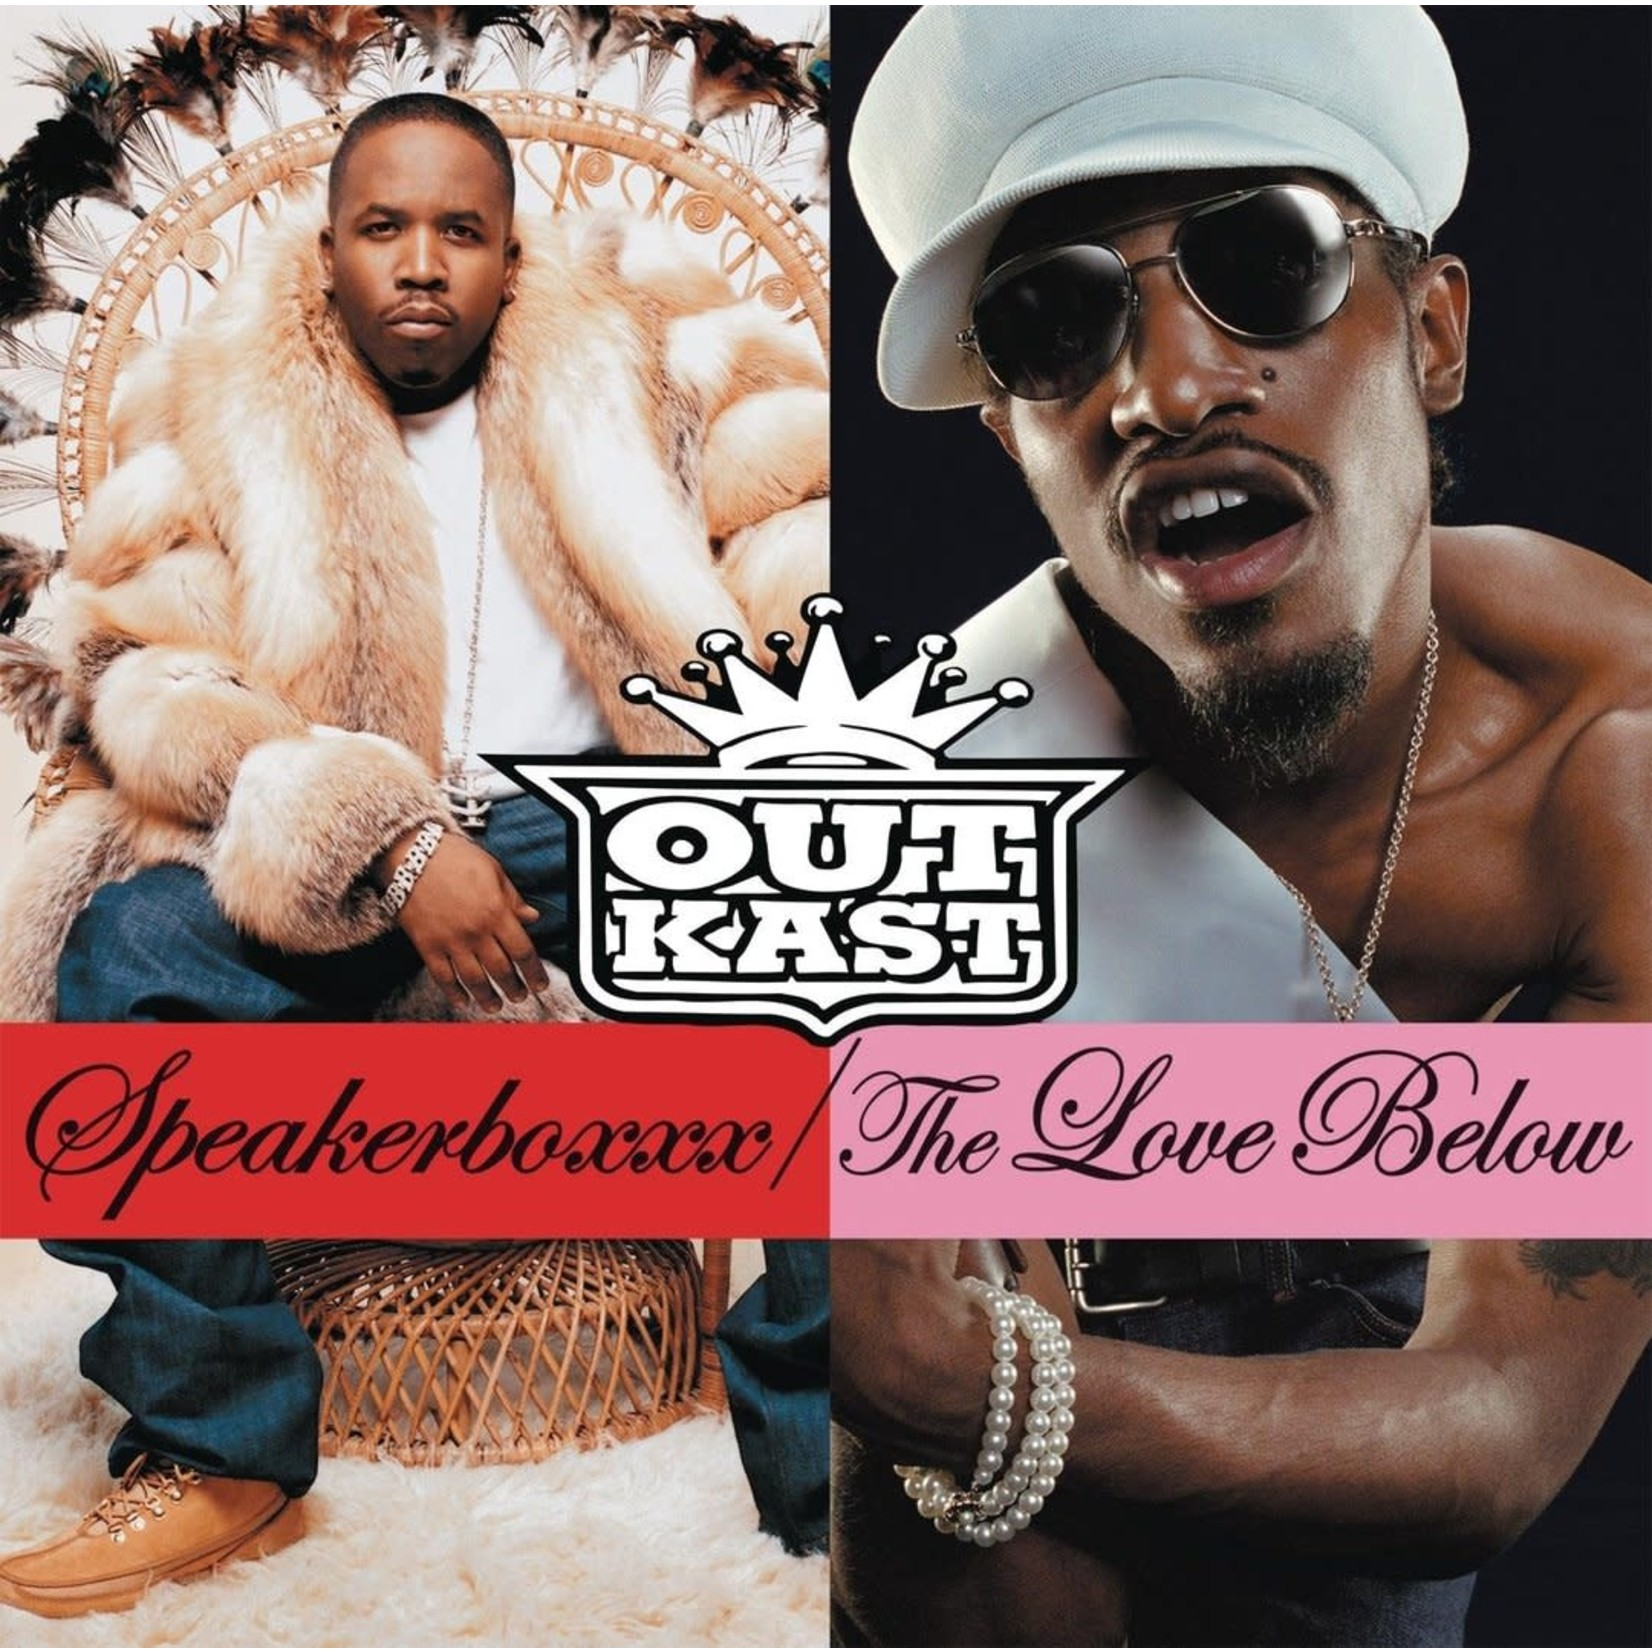 [New] Outkast: Speakerboxxx / The Love Below (4LP)